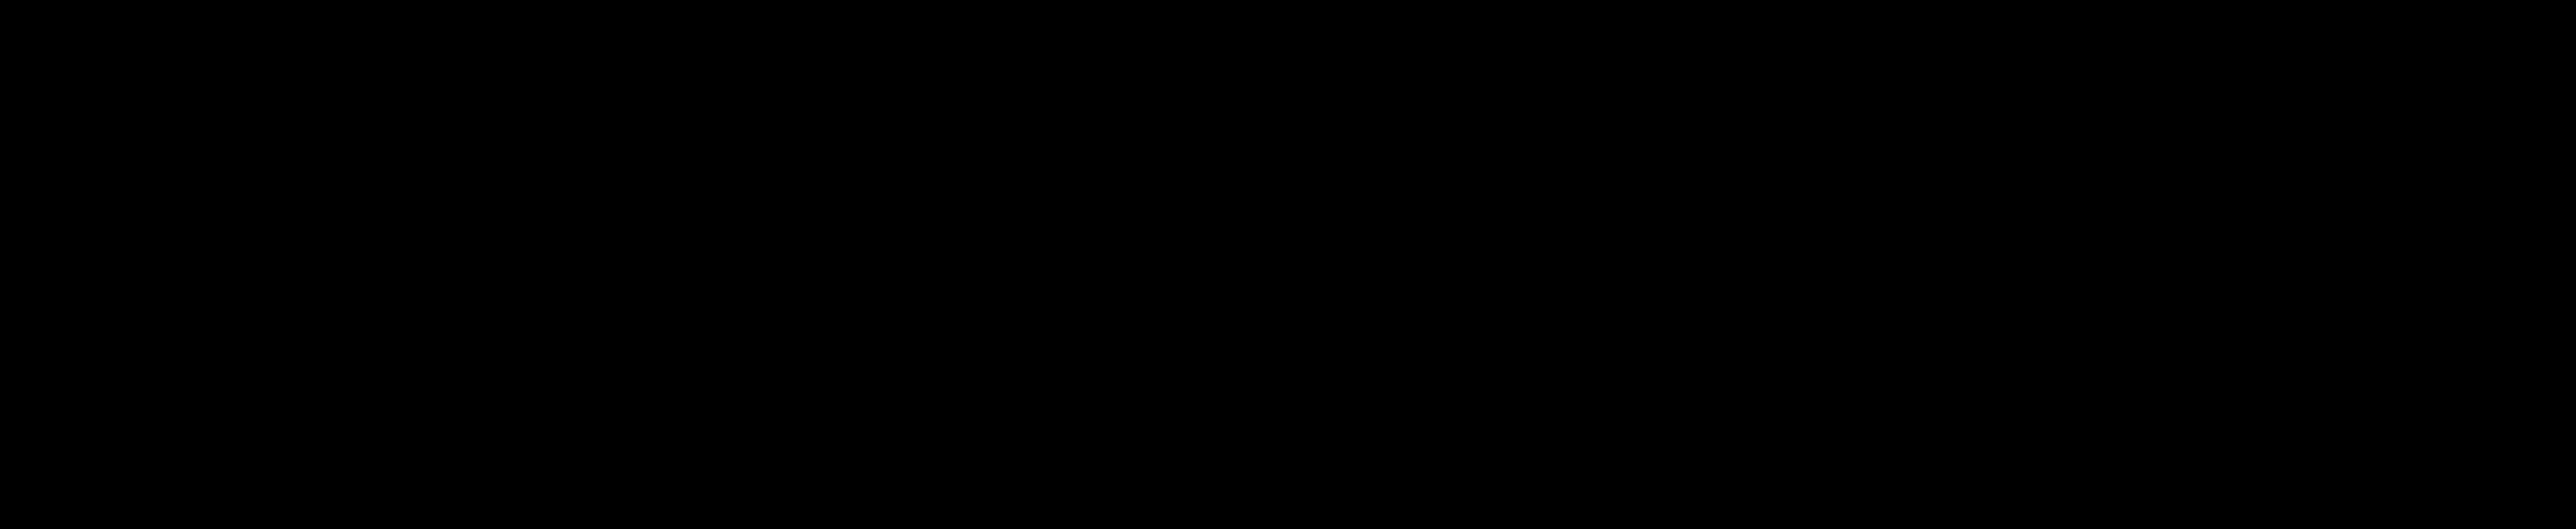 Curcumin-d<sub>6</sub>-diglucoside tetraacetate